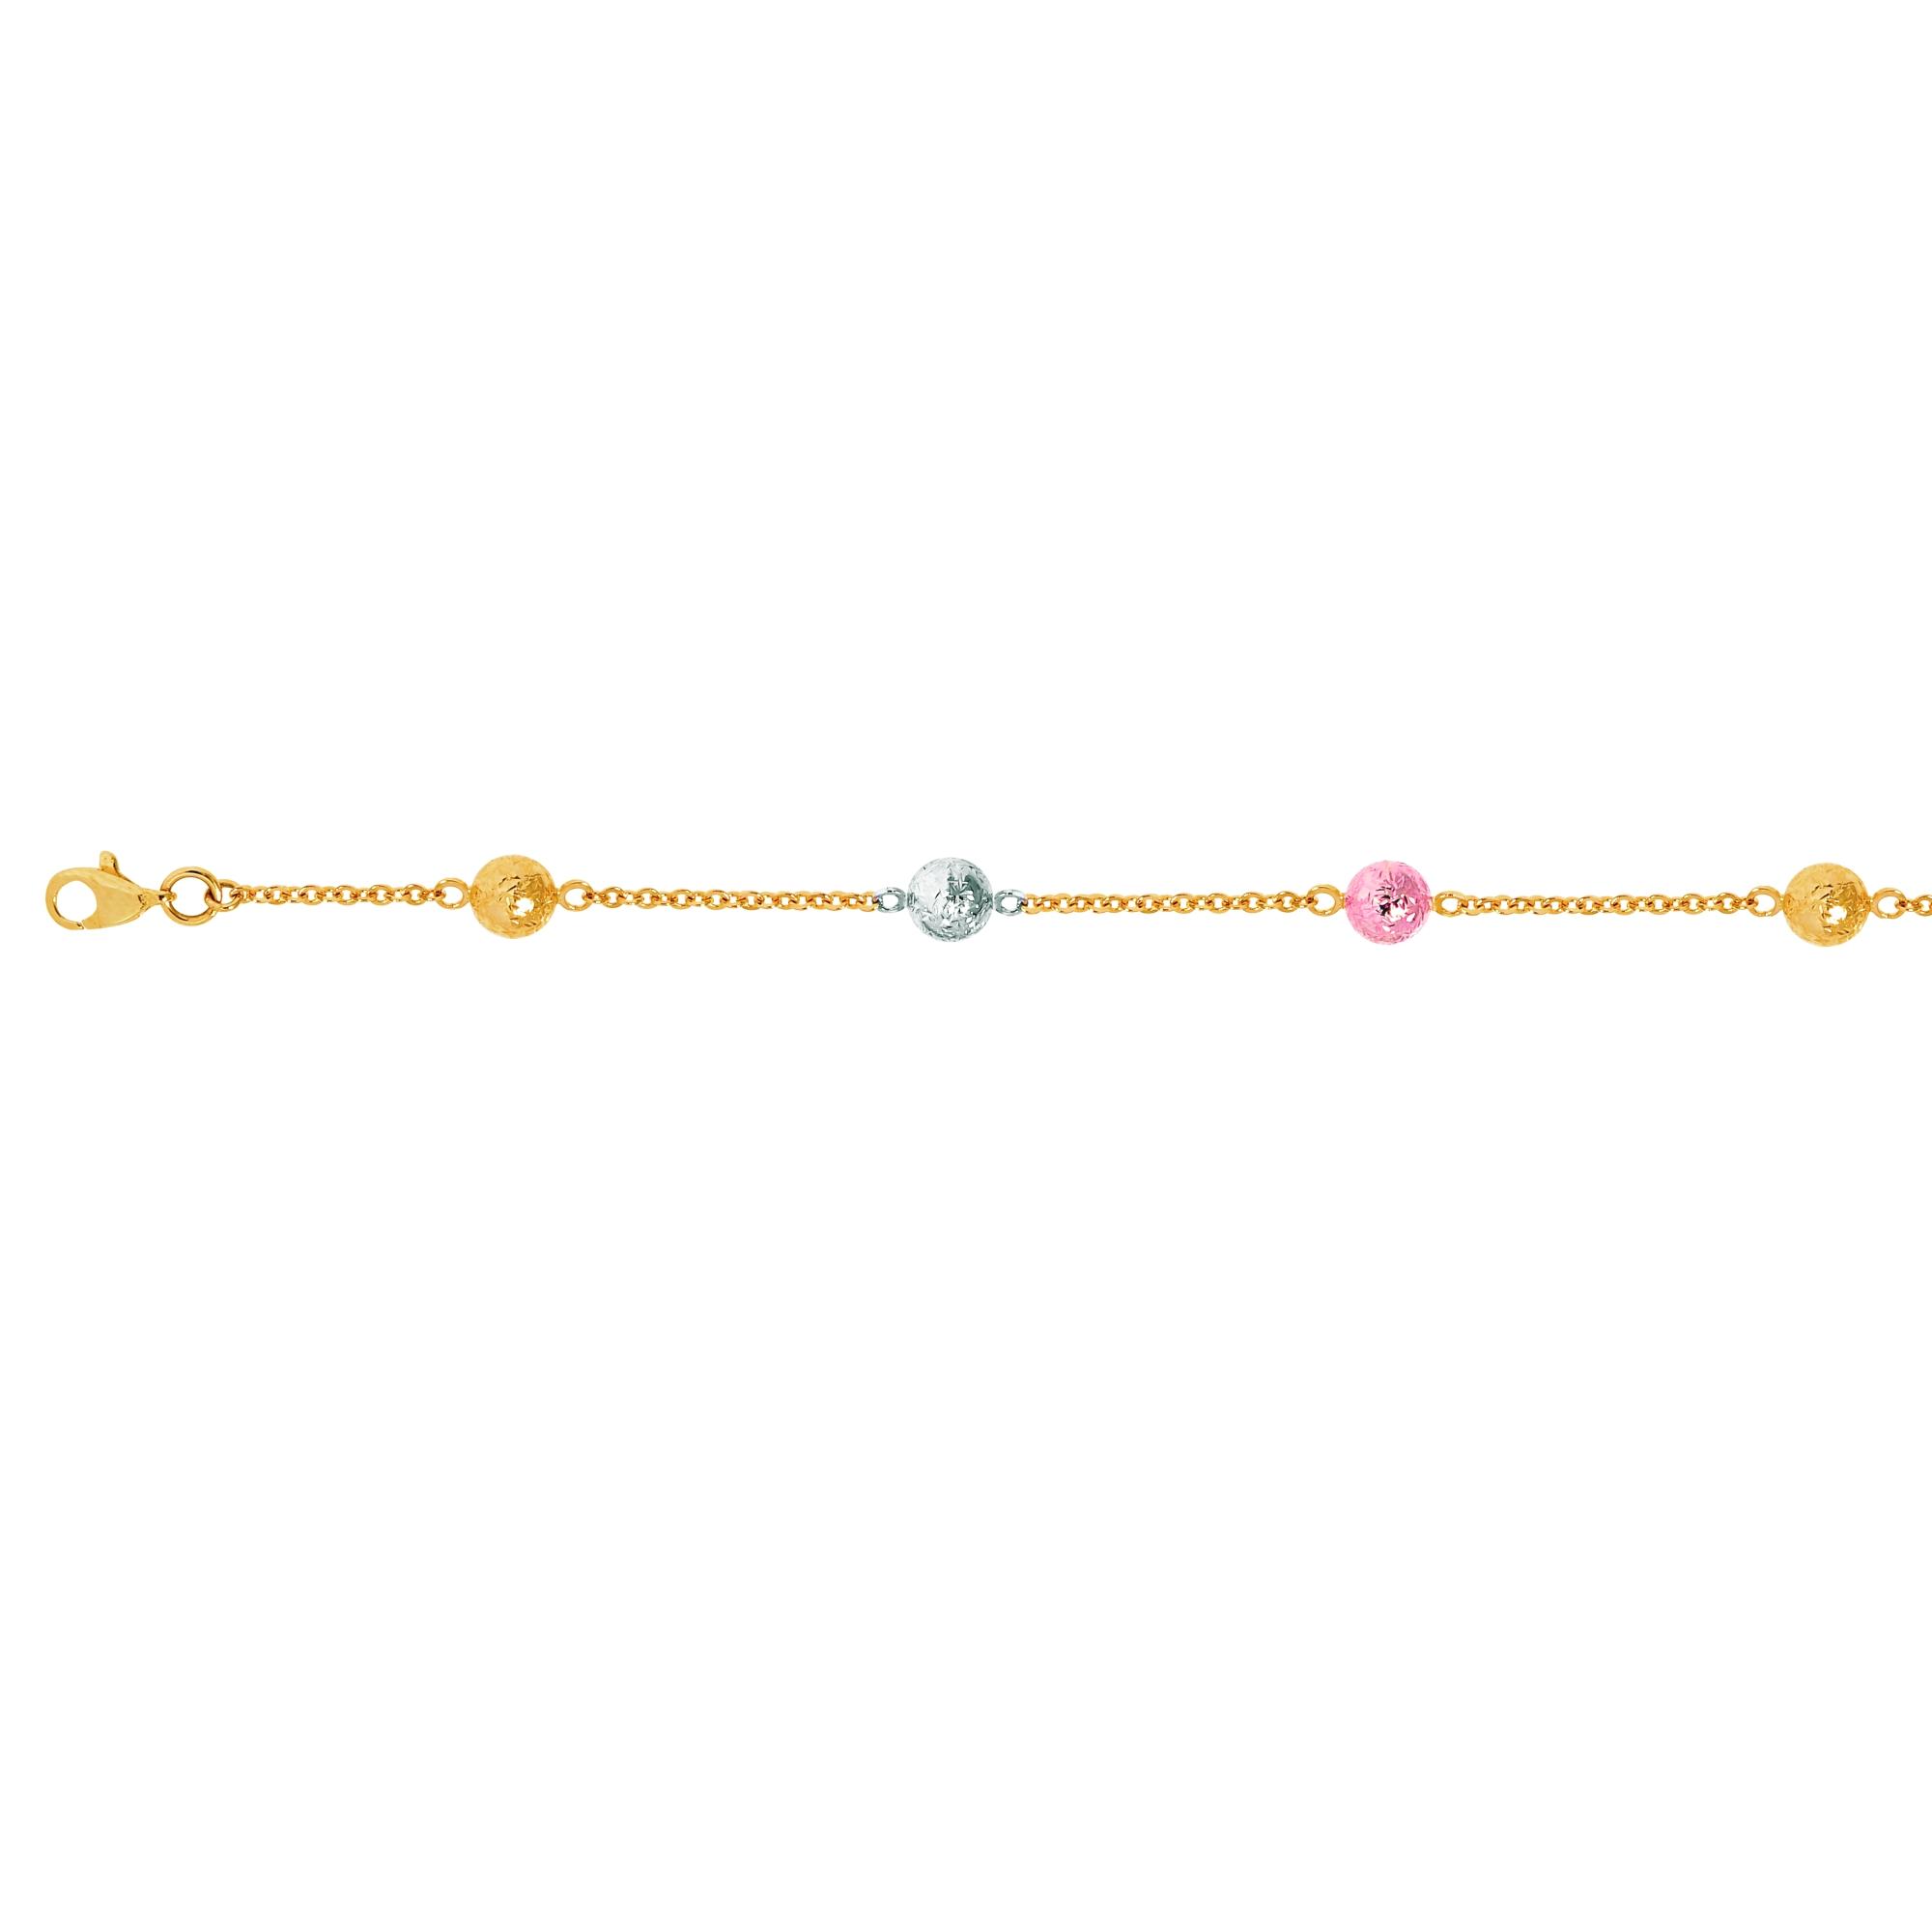 Jewelryweb 14k Tri-Color Pebble Bracelet - 7 Inch